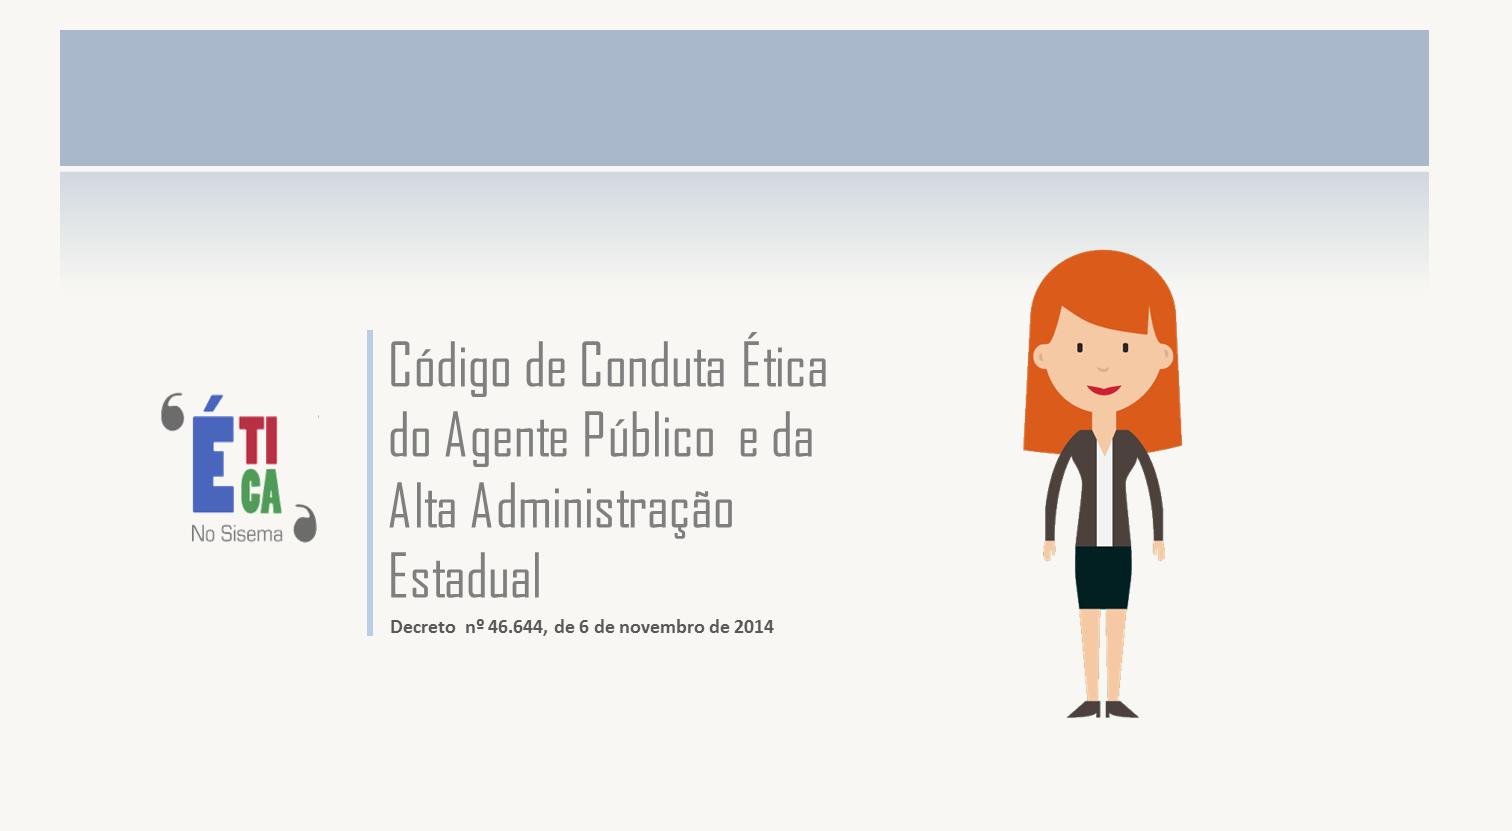 Decreto nº 46.644, de 6 de novembro de 2014